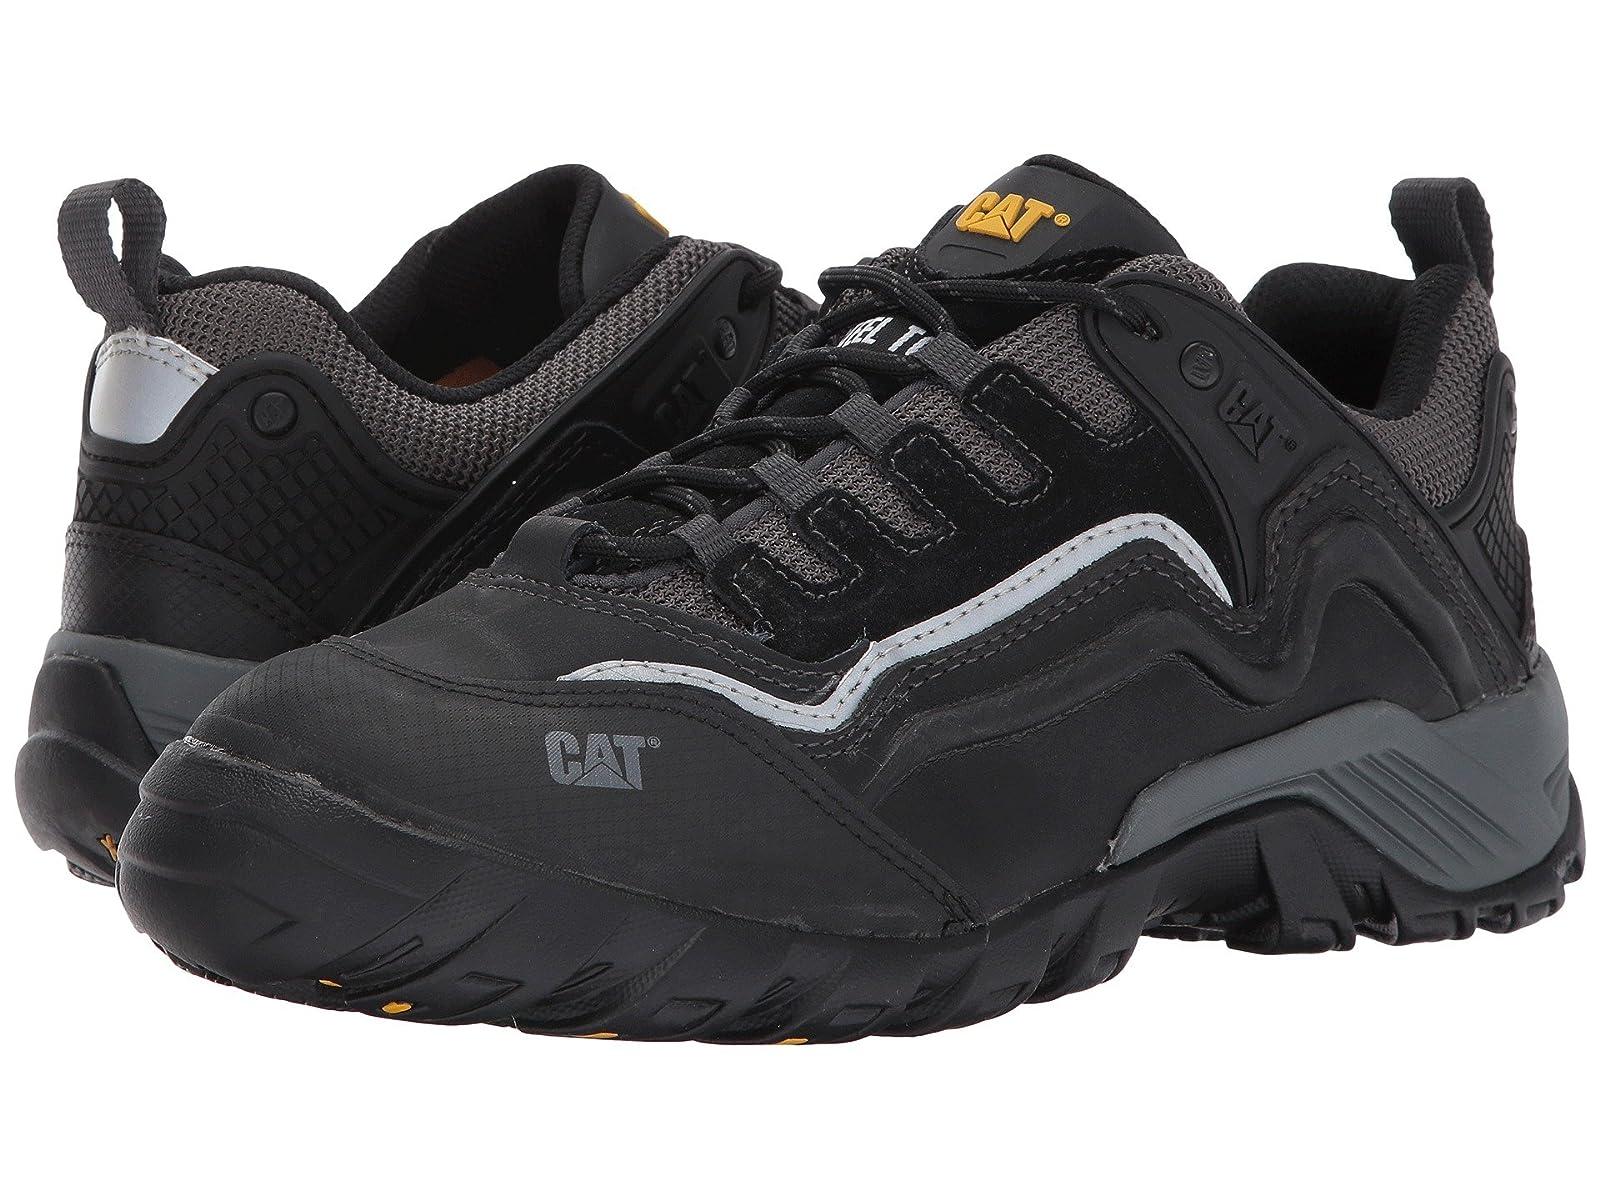 Caterpillar Pursuit 2.0 Steel ToeAtmospheric grades have affordable shoes